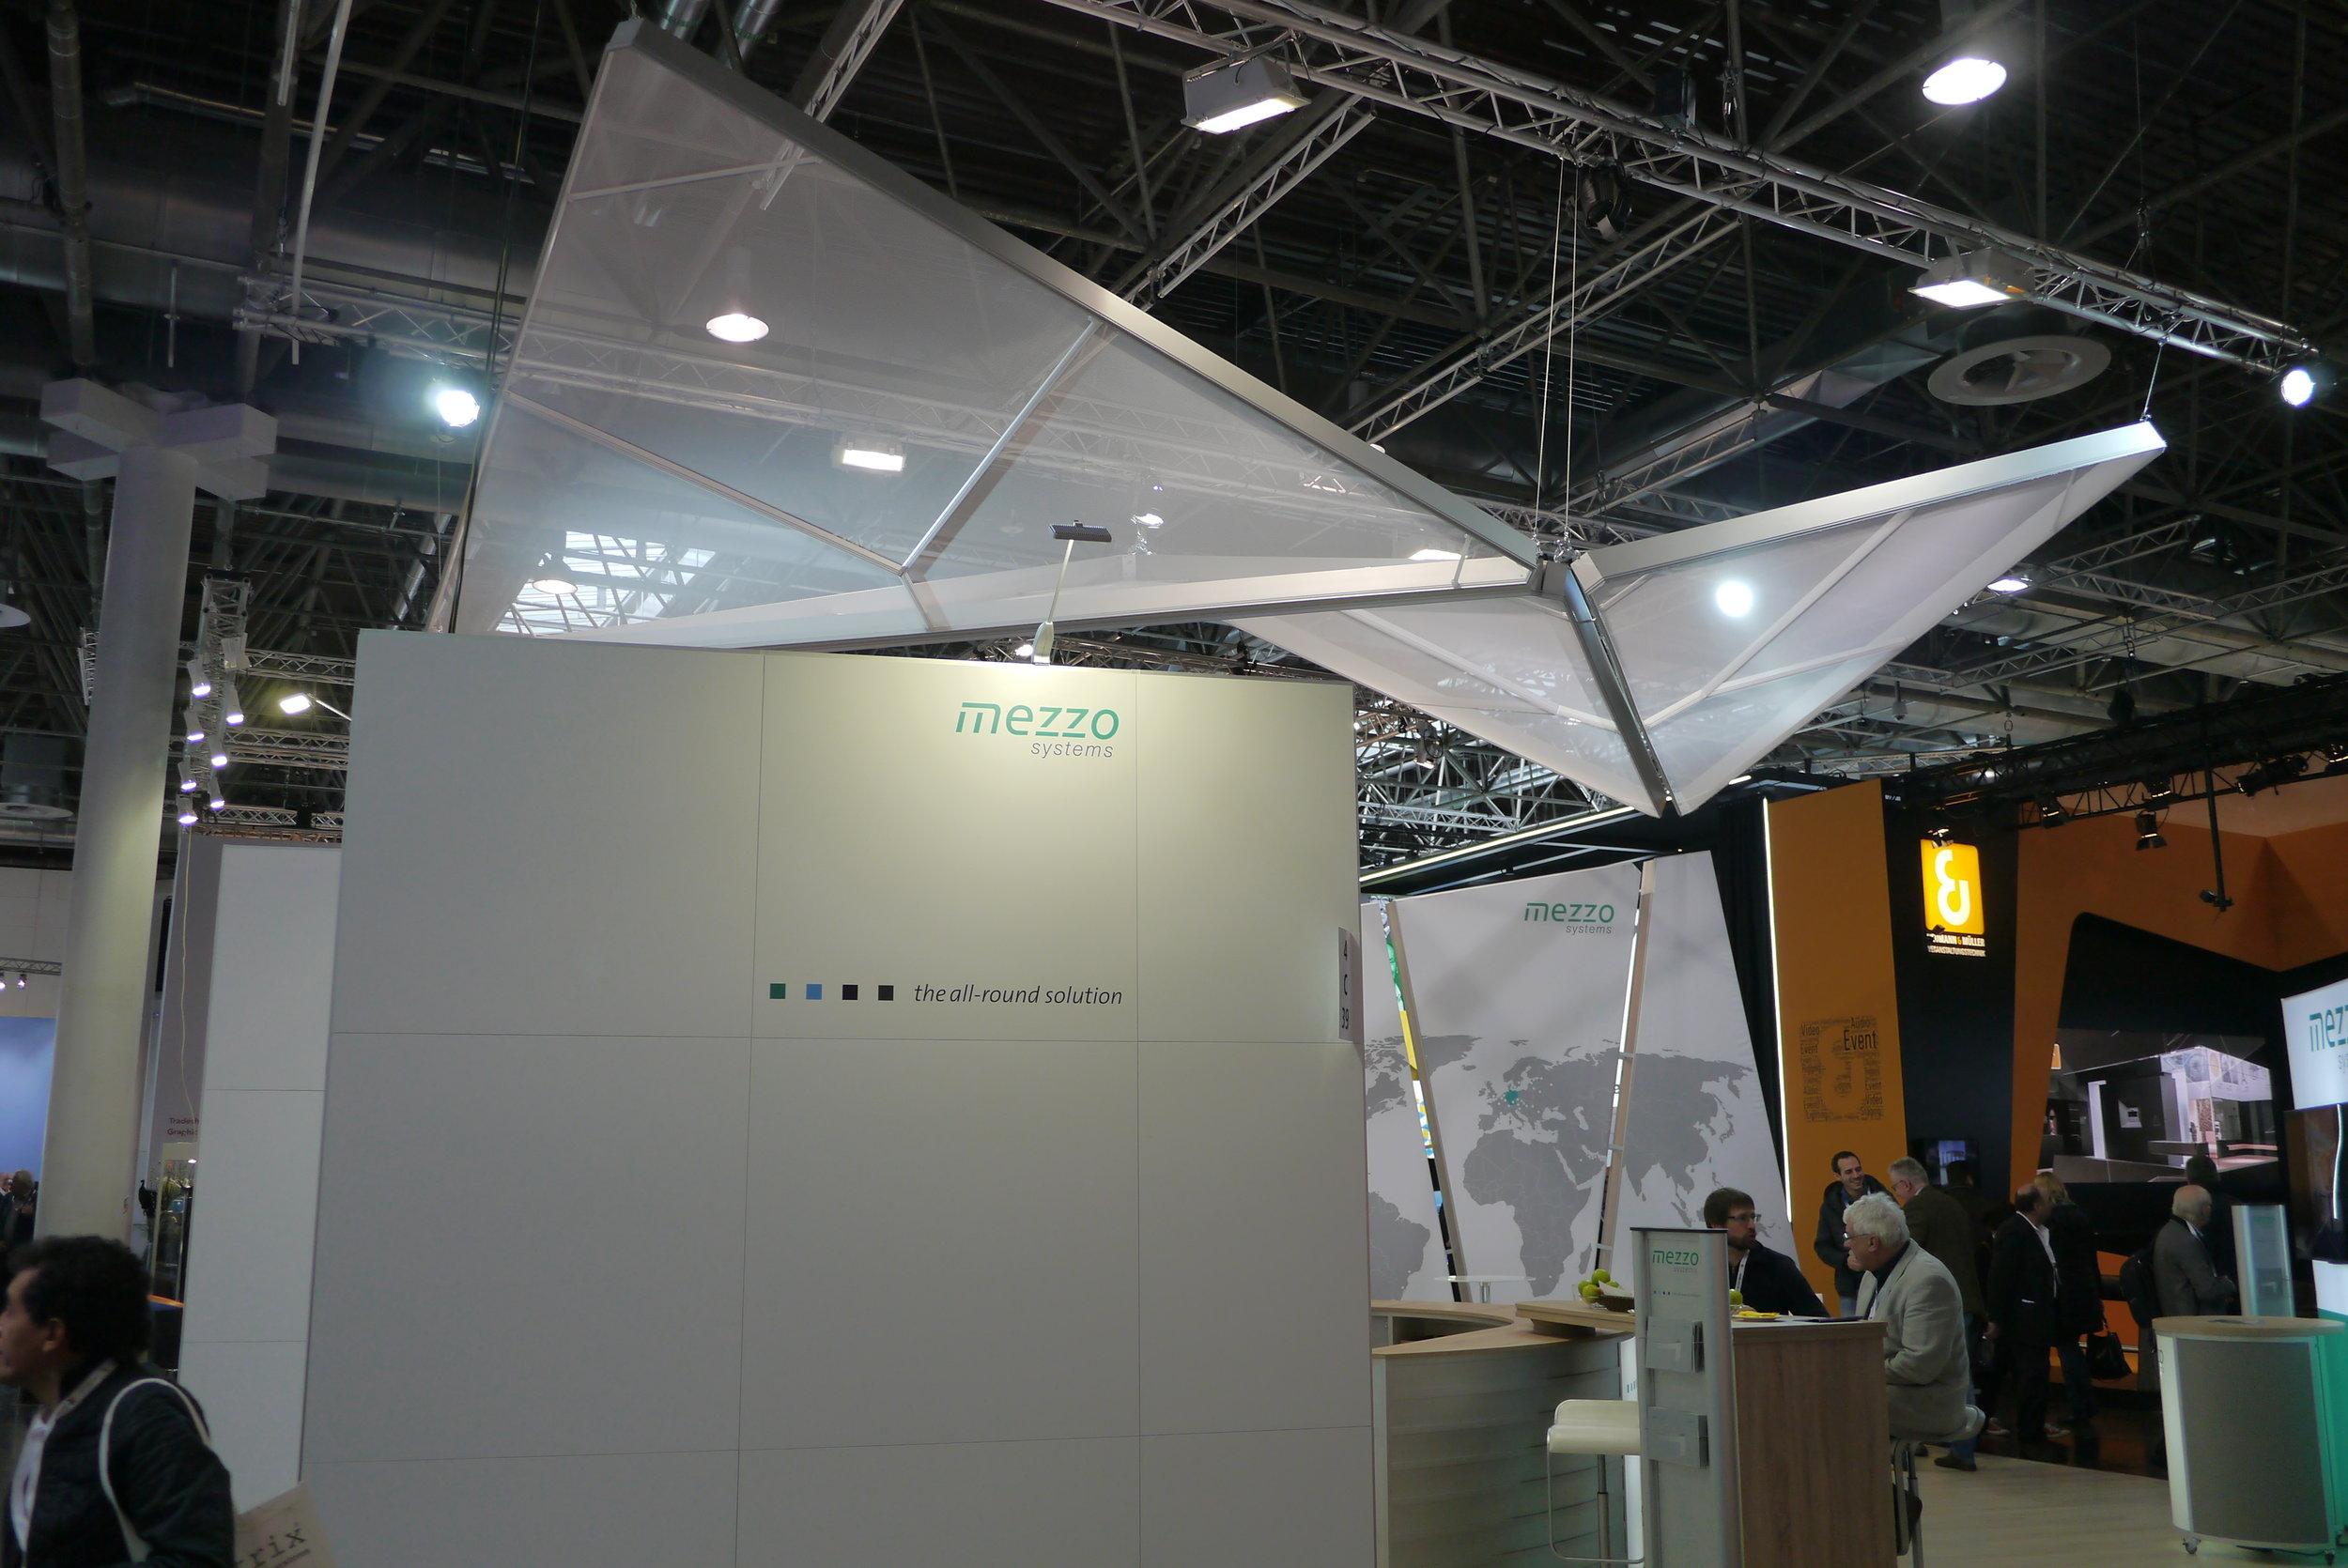 P1120261.JPG